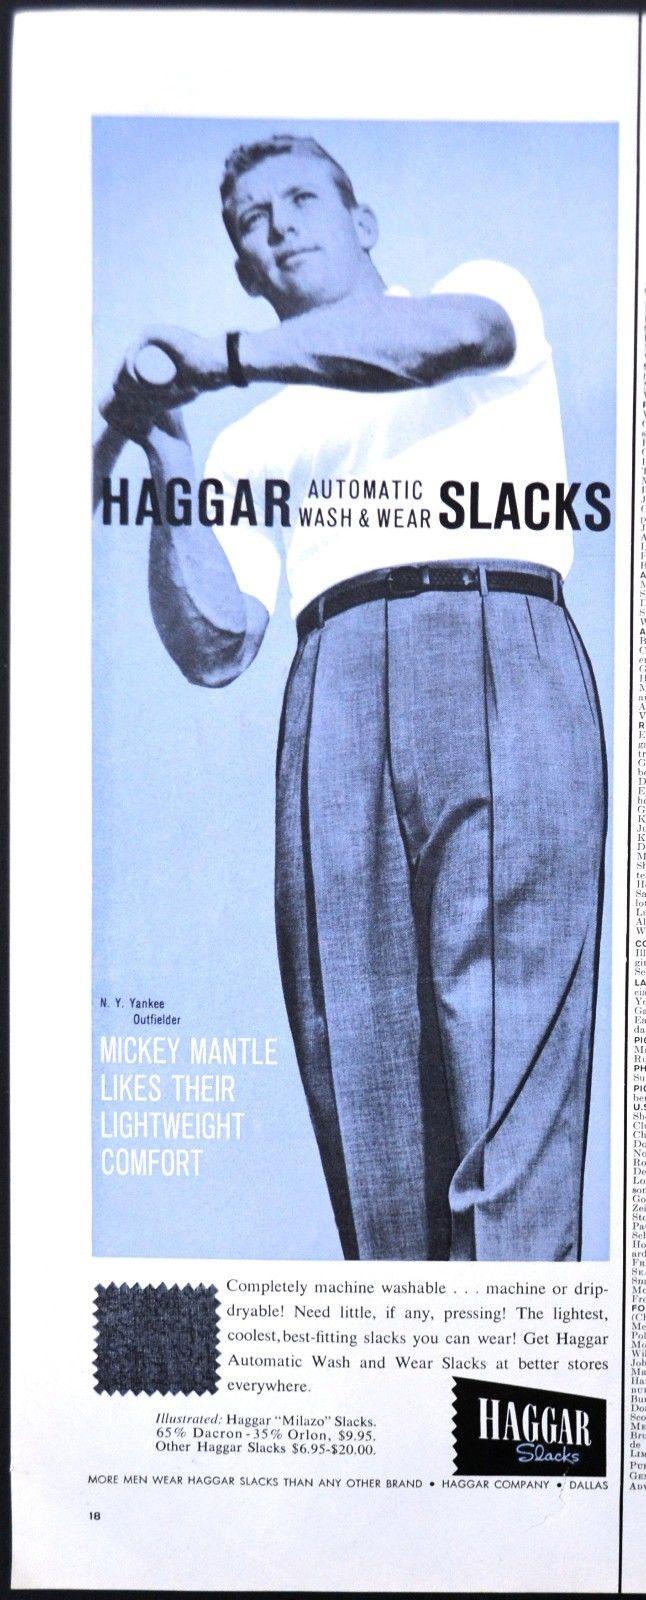 1959 life magazine